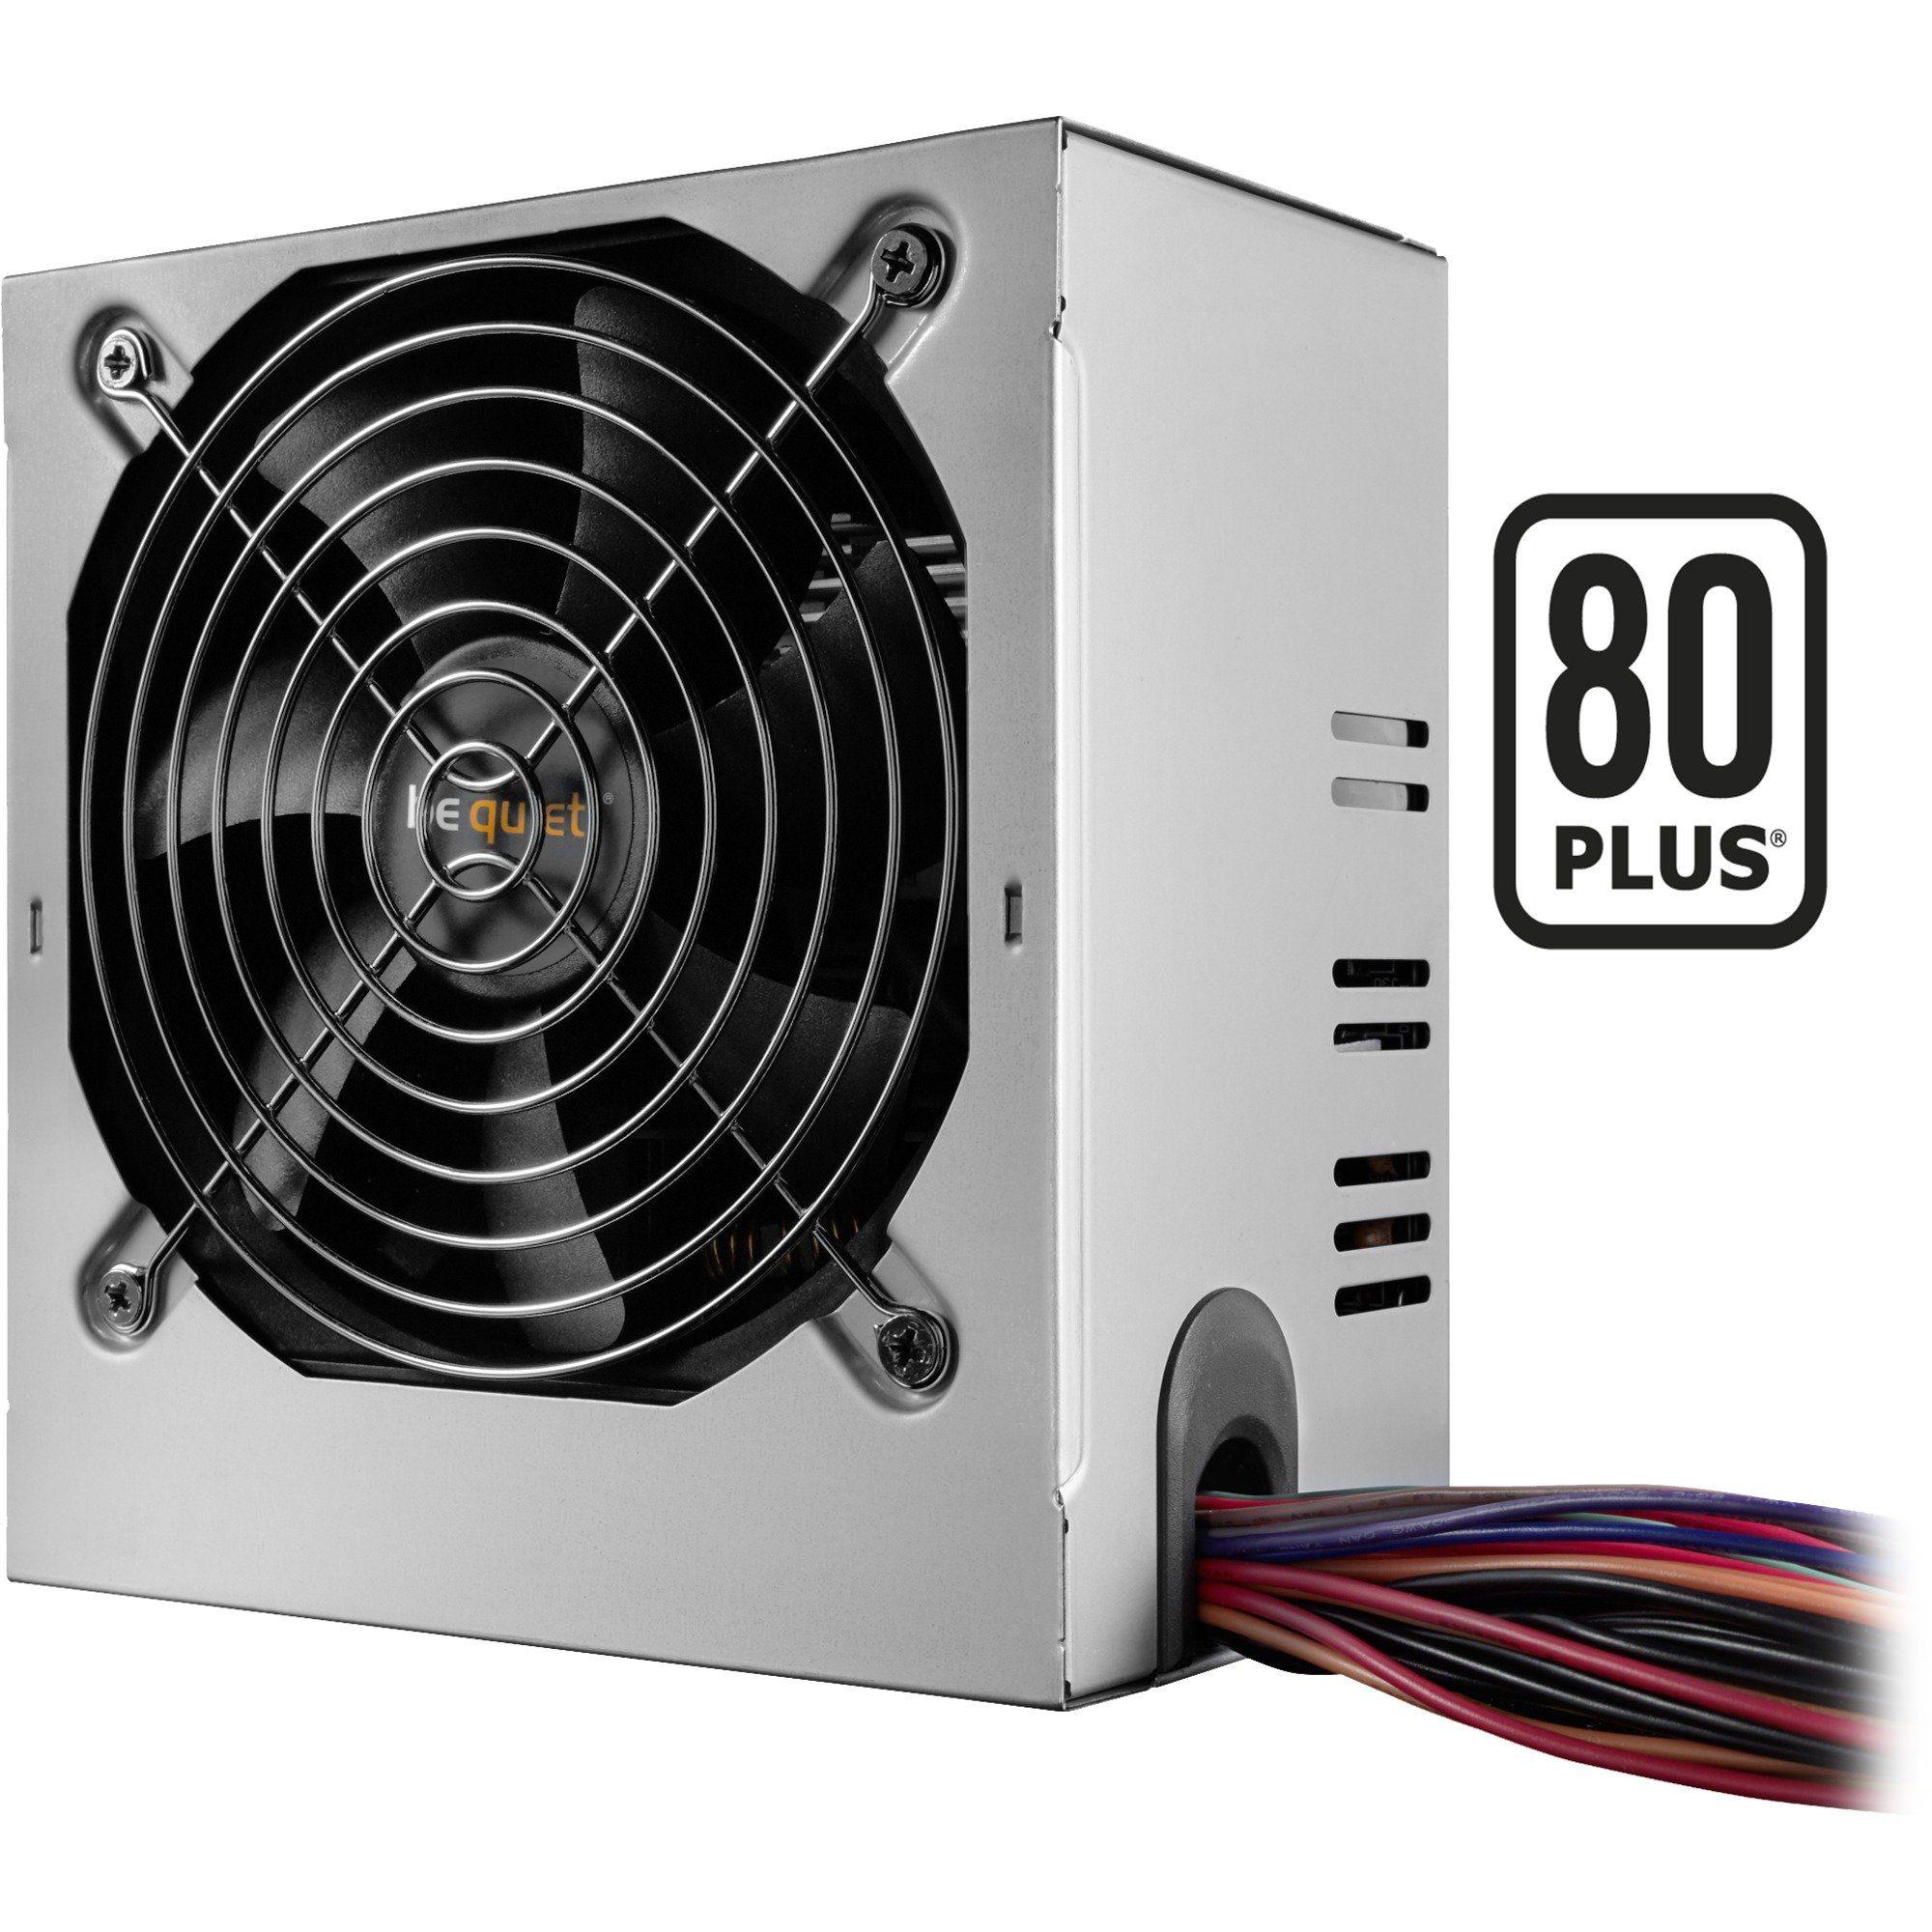 be quiet! PC-Netzteil »System Power B8 450W«